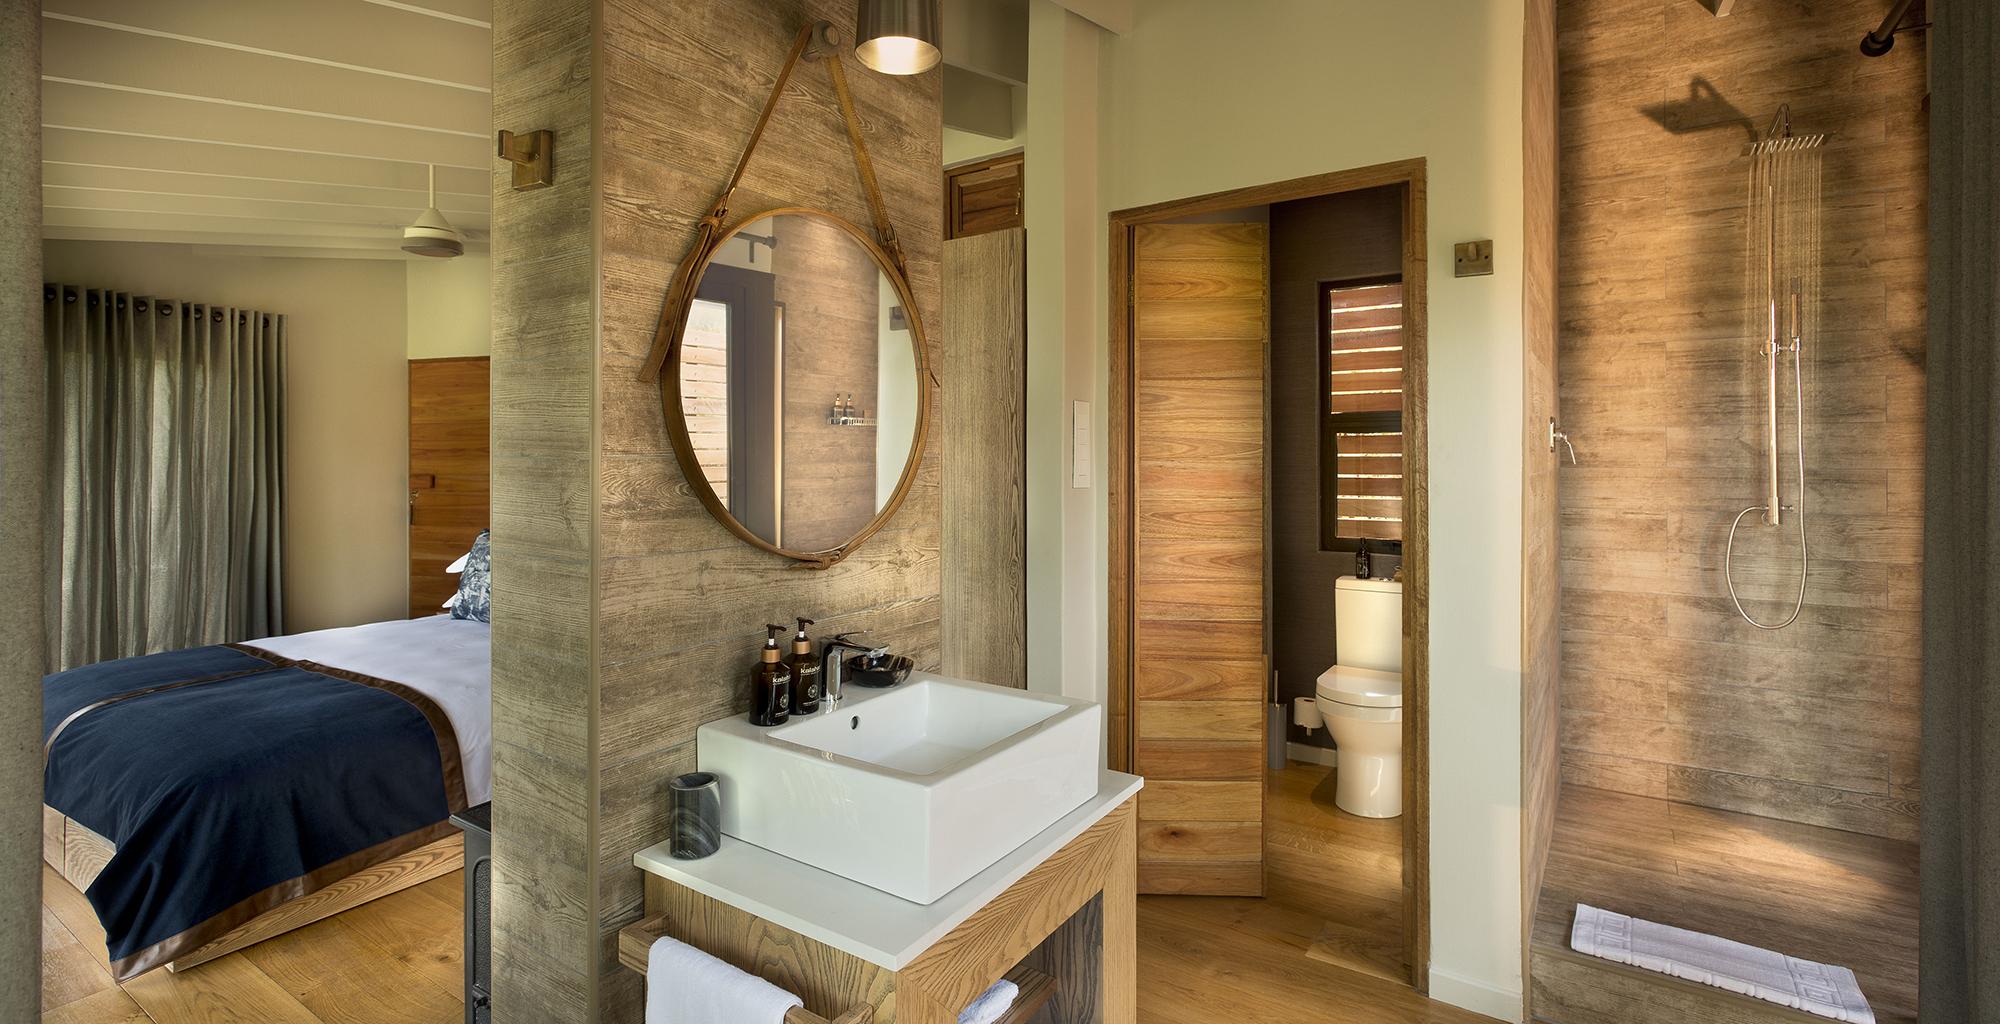 South-Africa-Marataba-Mountain-Lodge-Bathroom